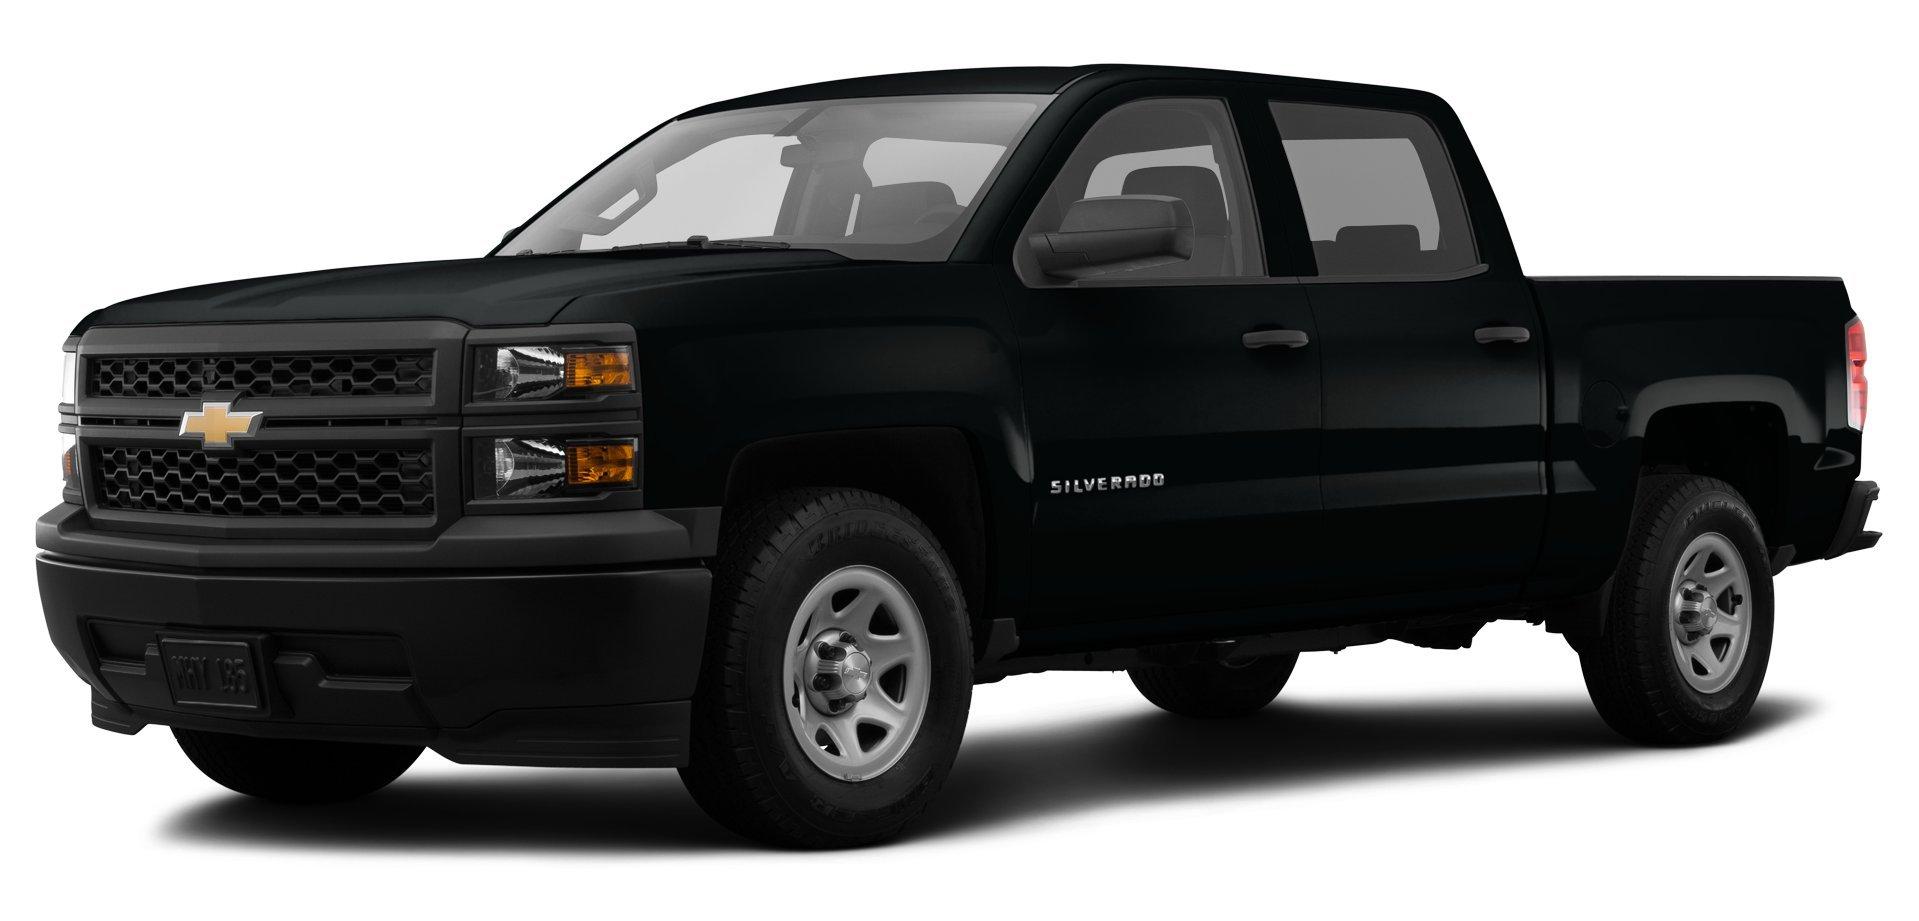 "... 2015 Chevrolet Silverado 1500 Work Truck, 2-Wheel Drive Crew Cab 153.0"""